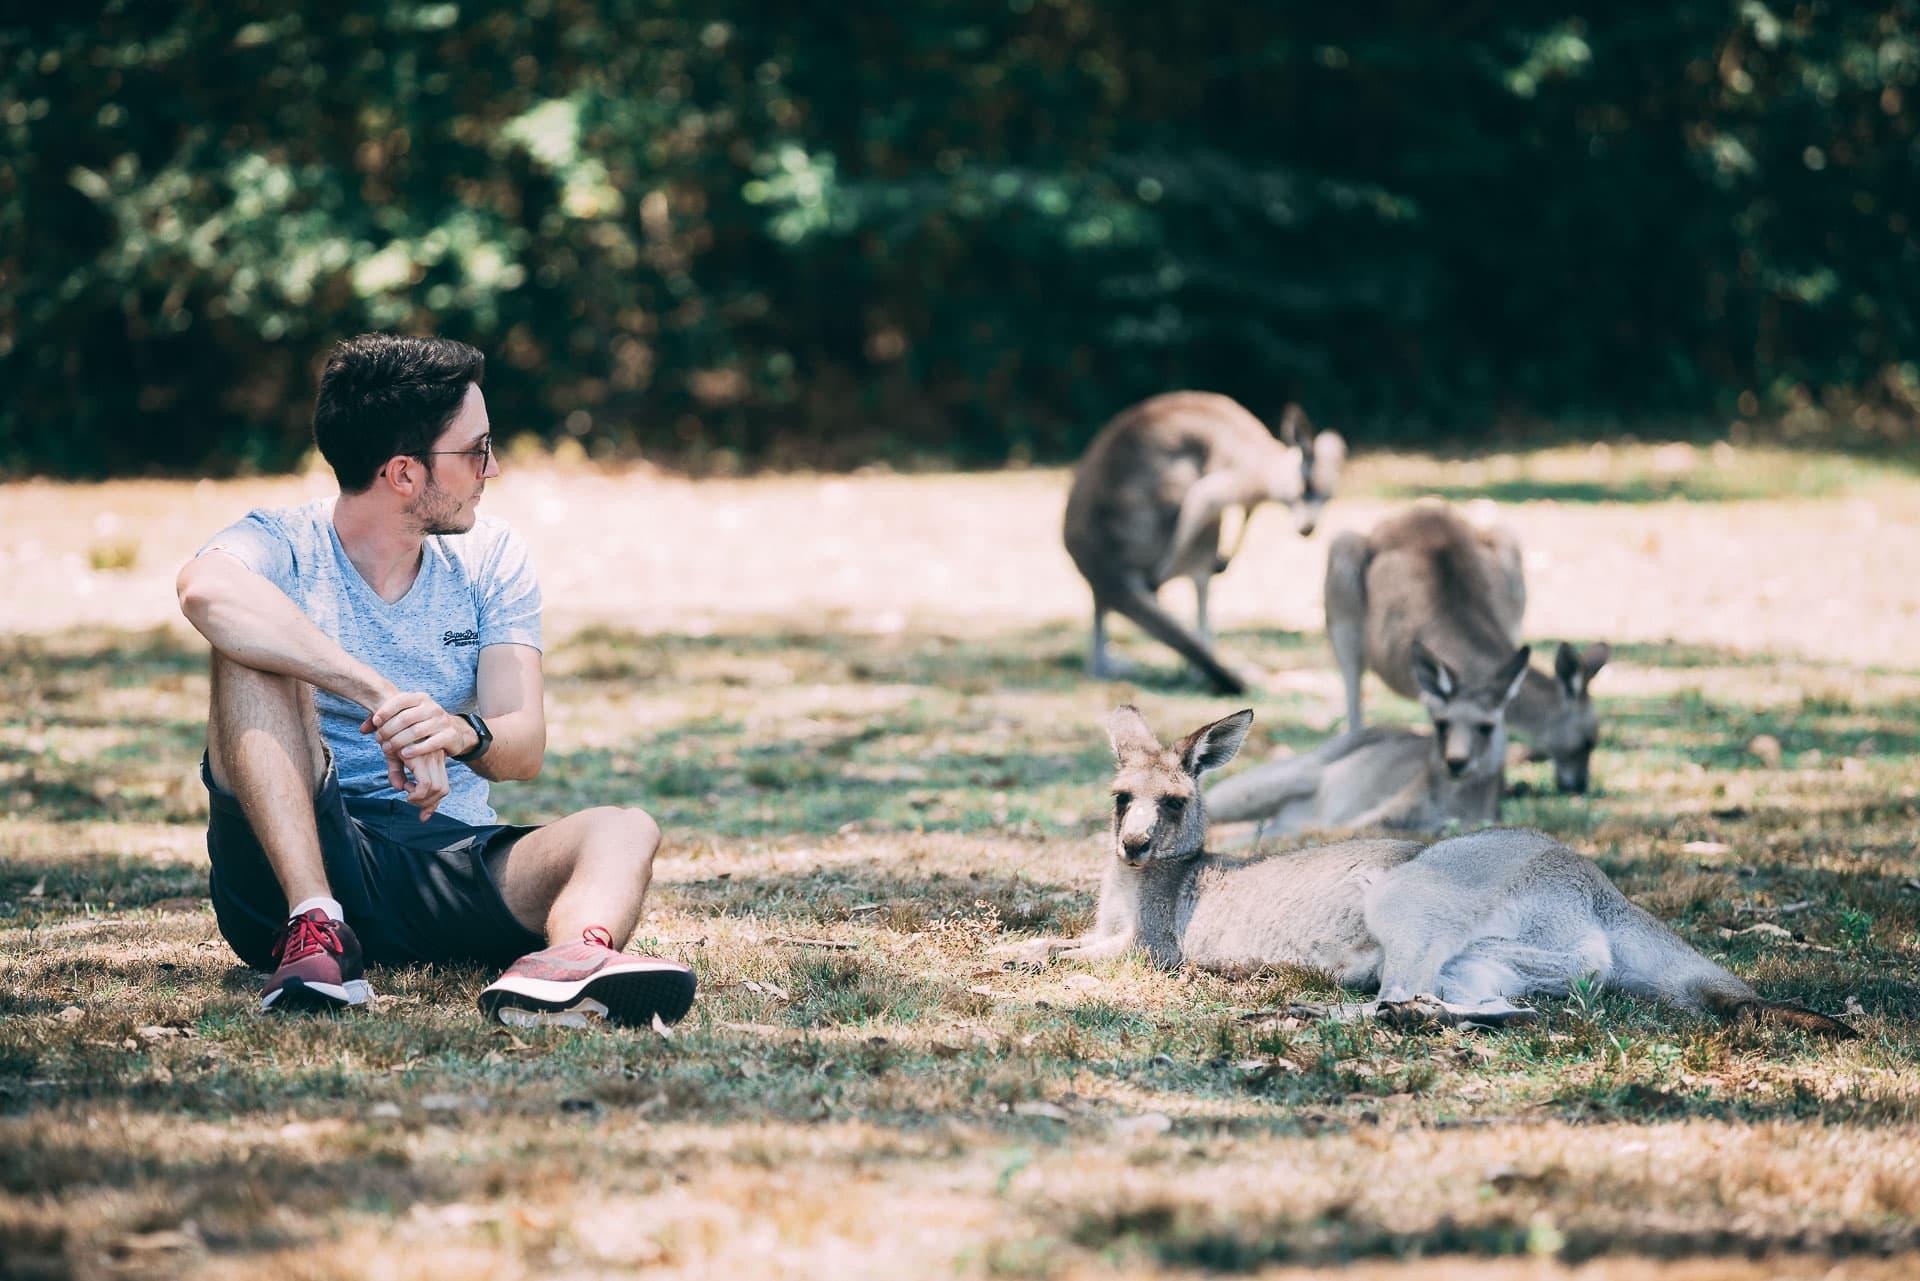 morisset park sydney kangourous